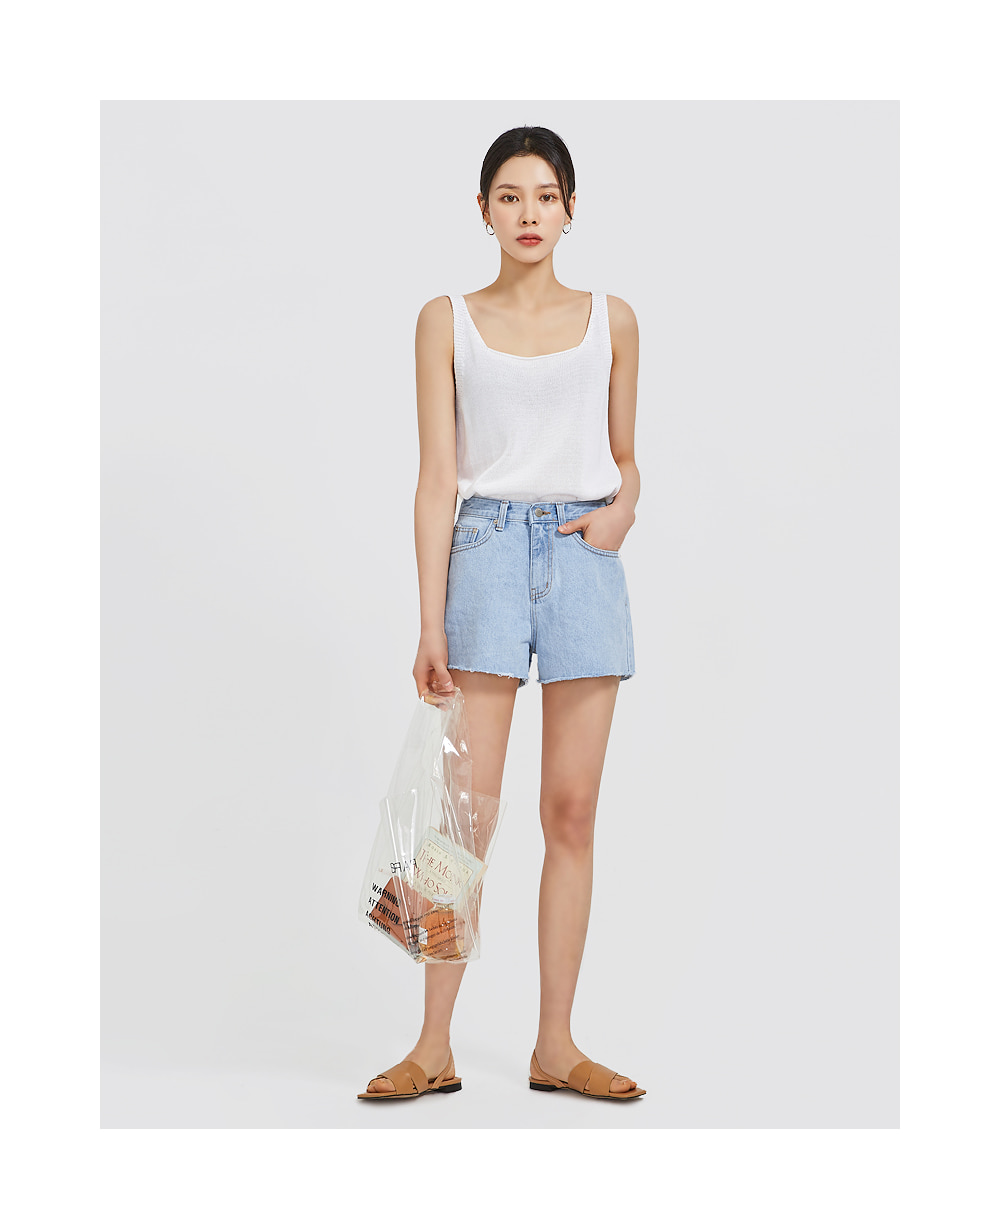 AIN - Korean Fashion - #Kfashion - Celine Paris Pvc Bag